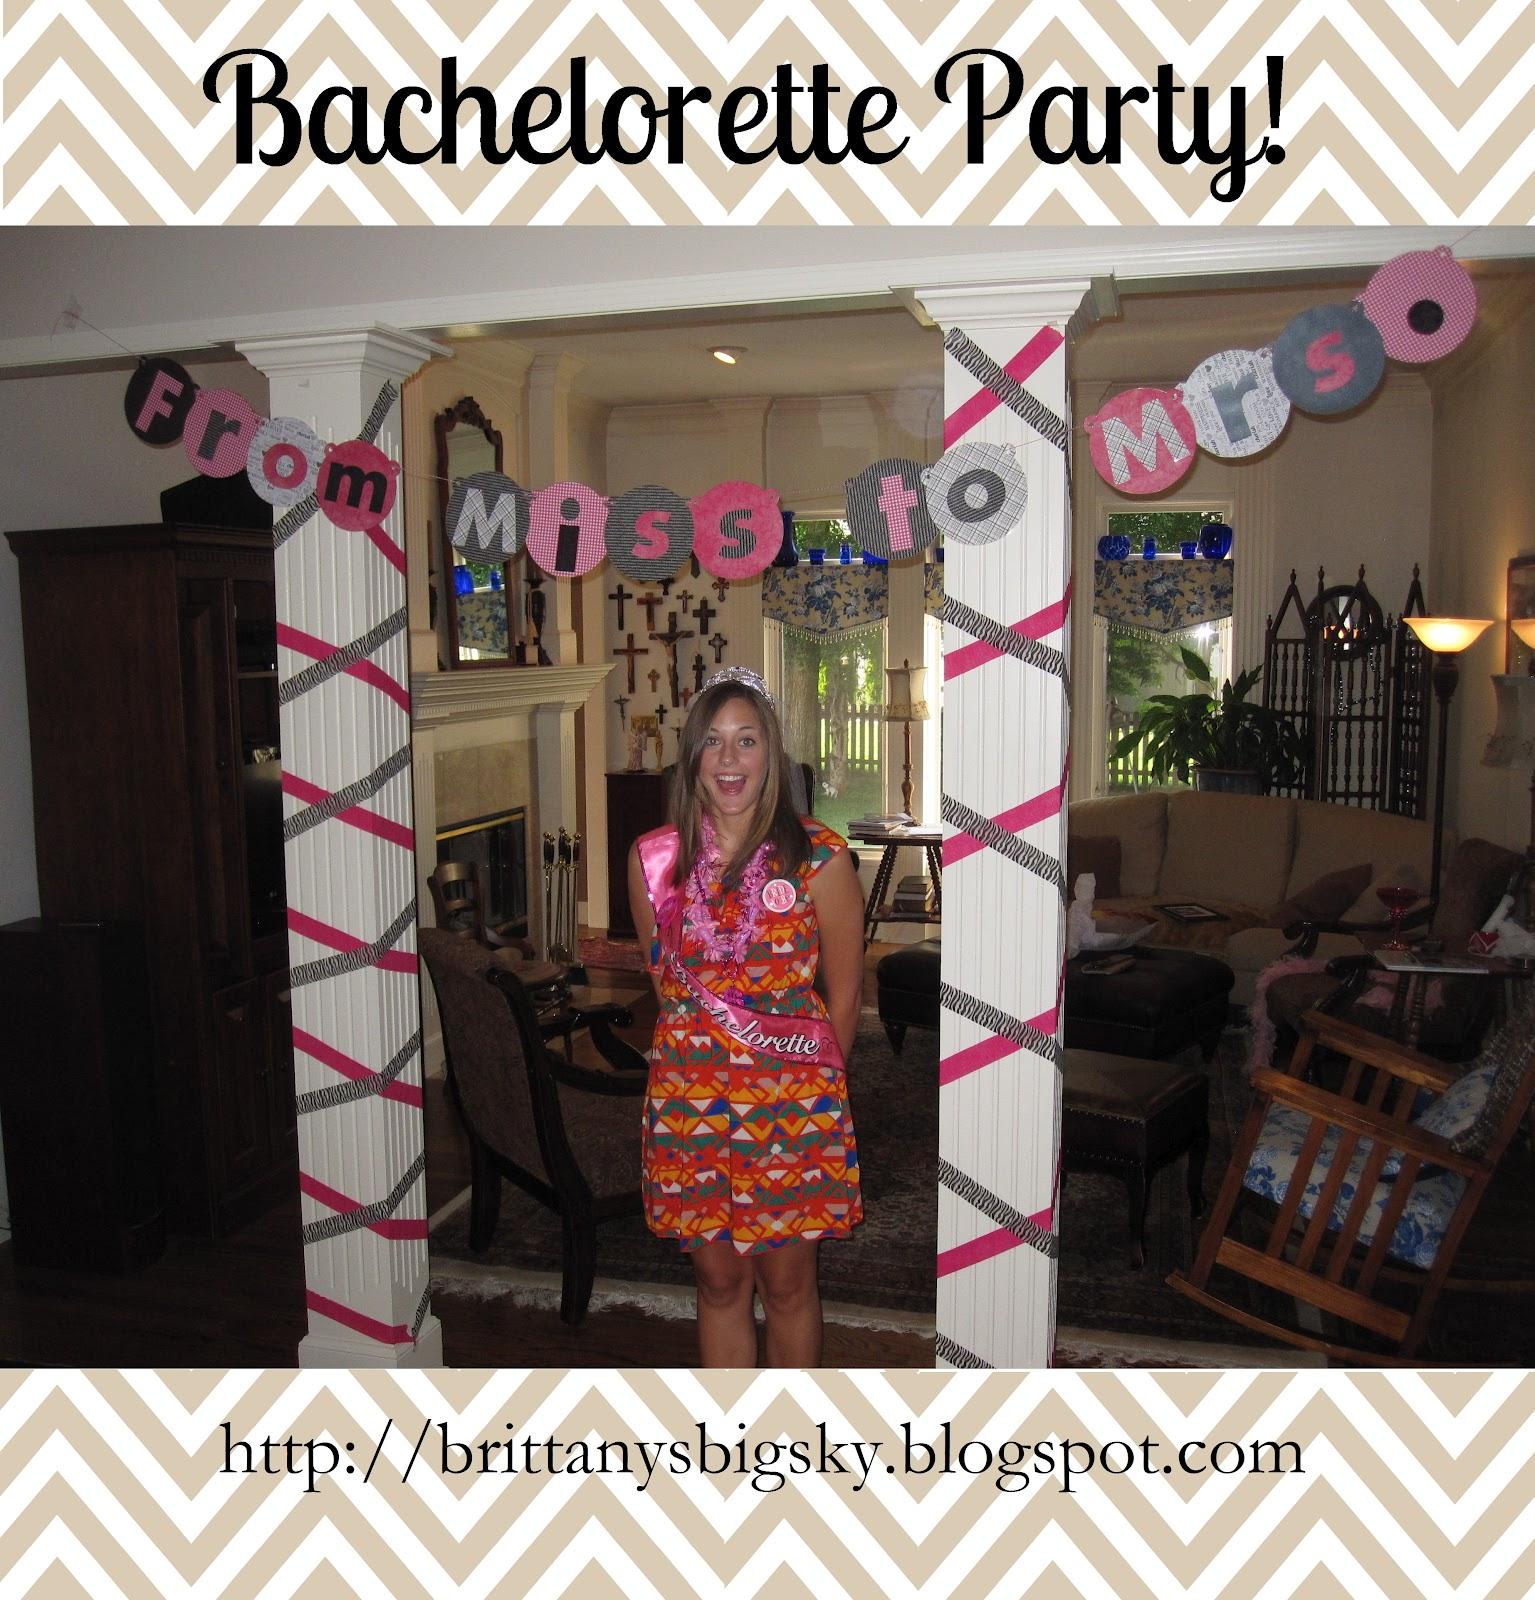 From mizzou to missoula bachelorette party decorations for Bachelorette decoration